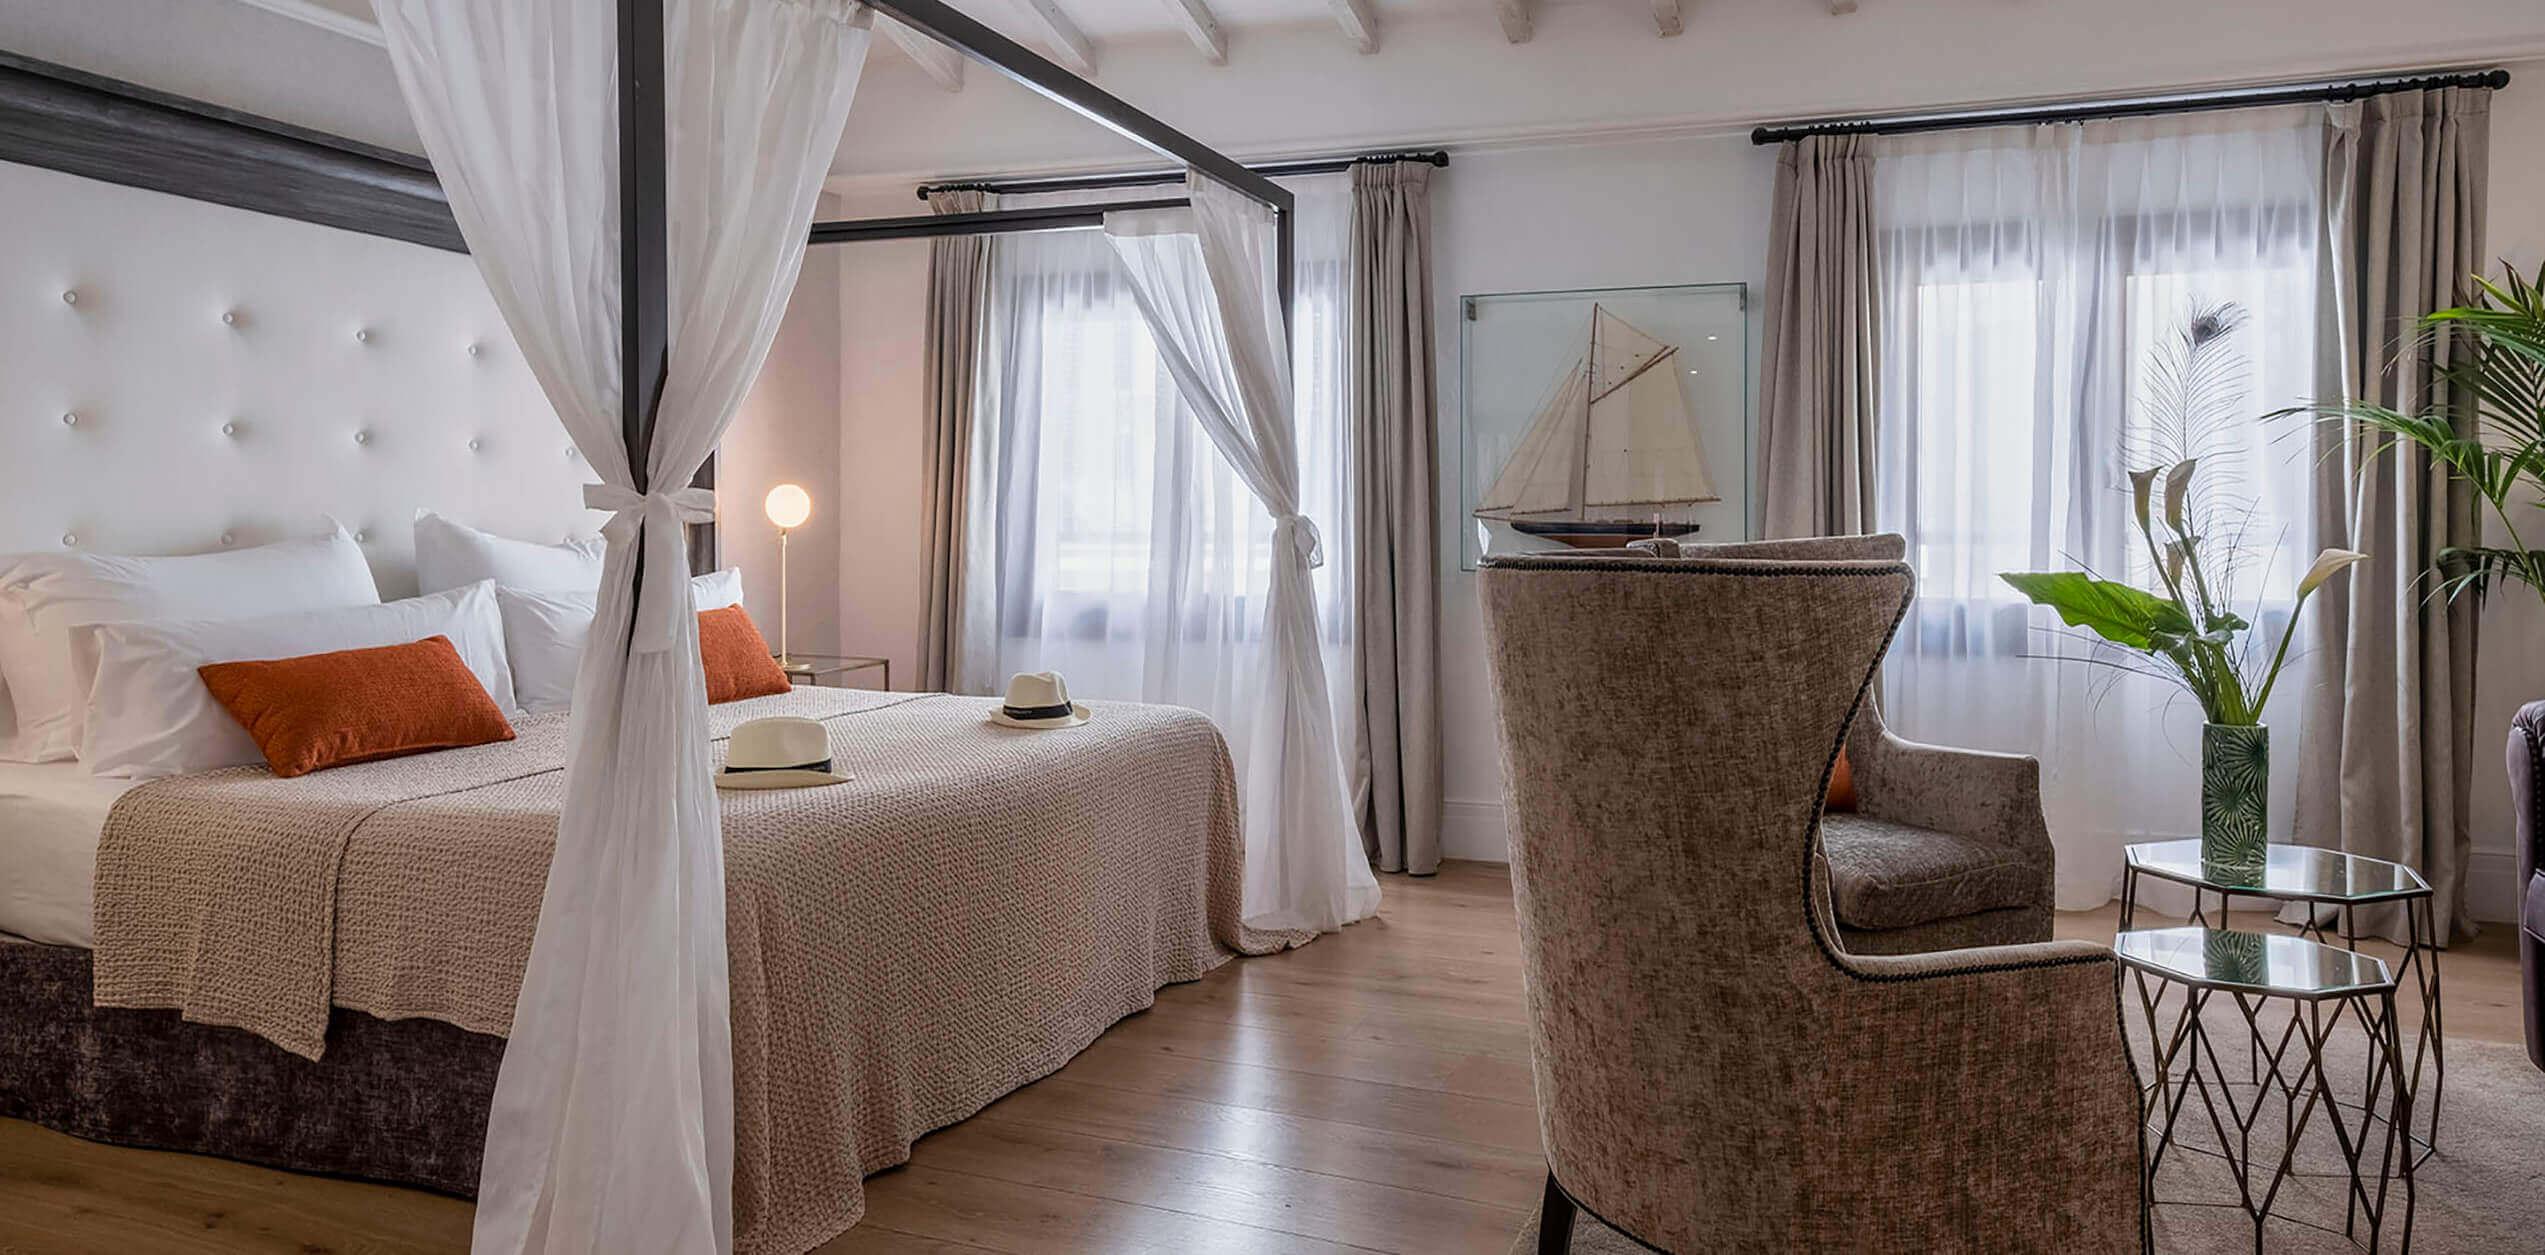 suite-boutique-hotel-palma-mallorca-posada-terra-santa